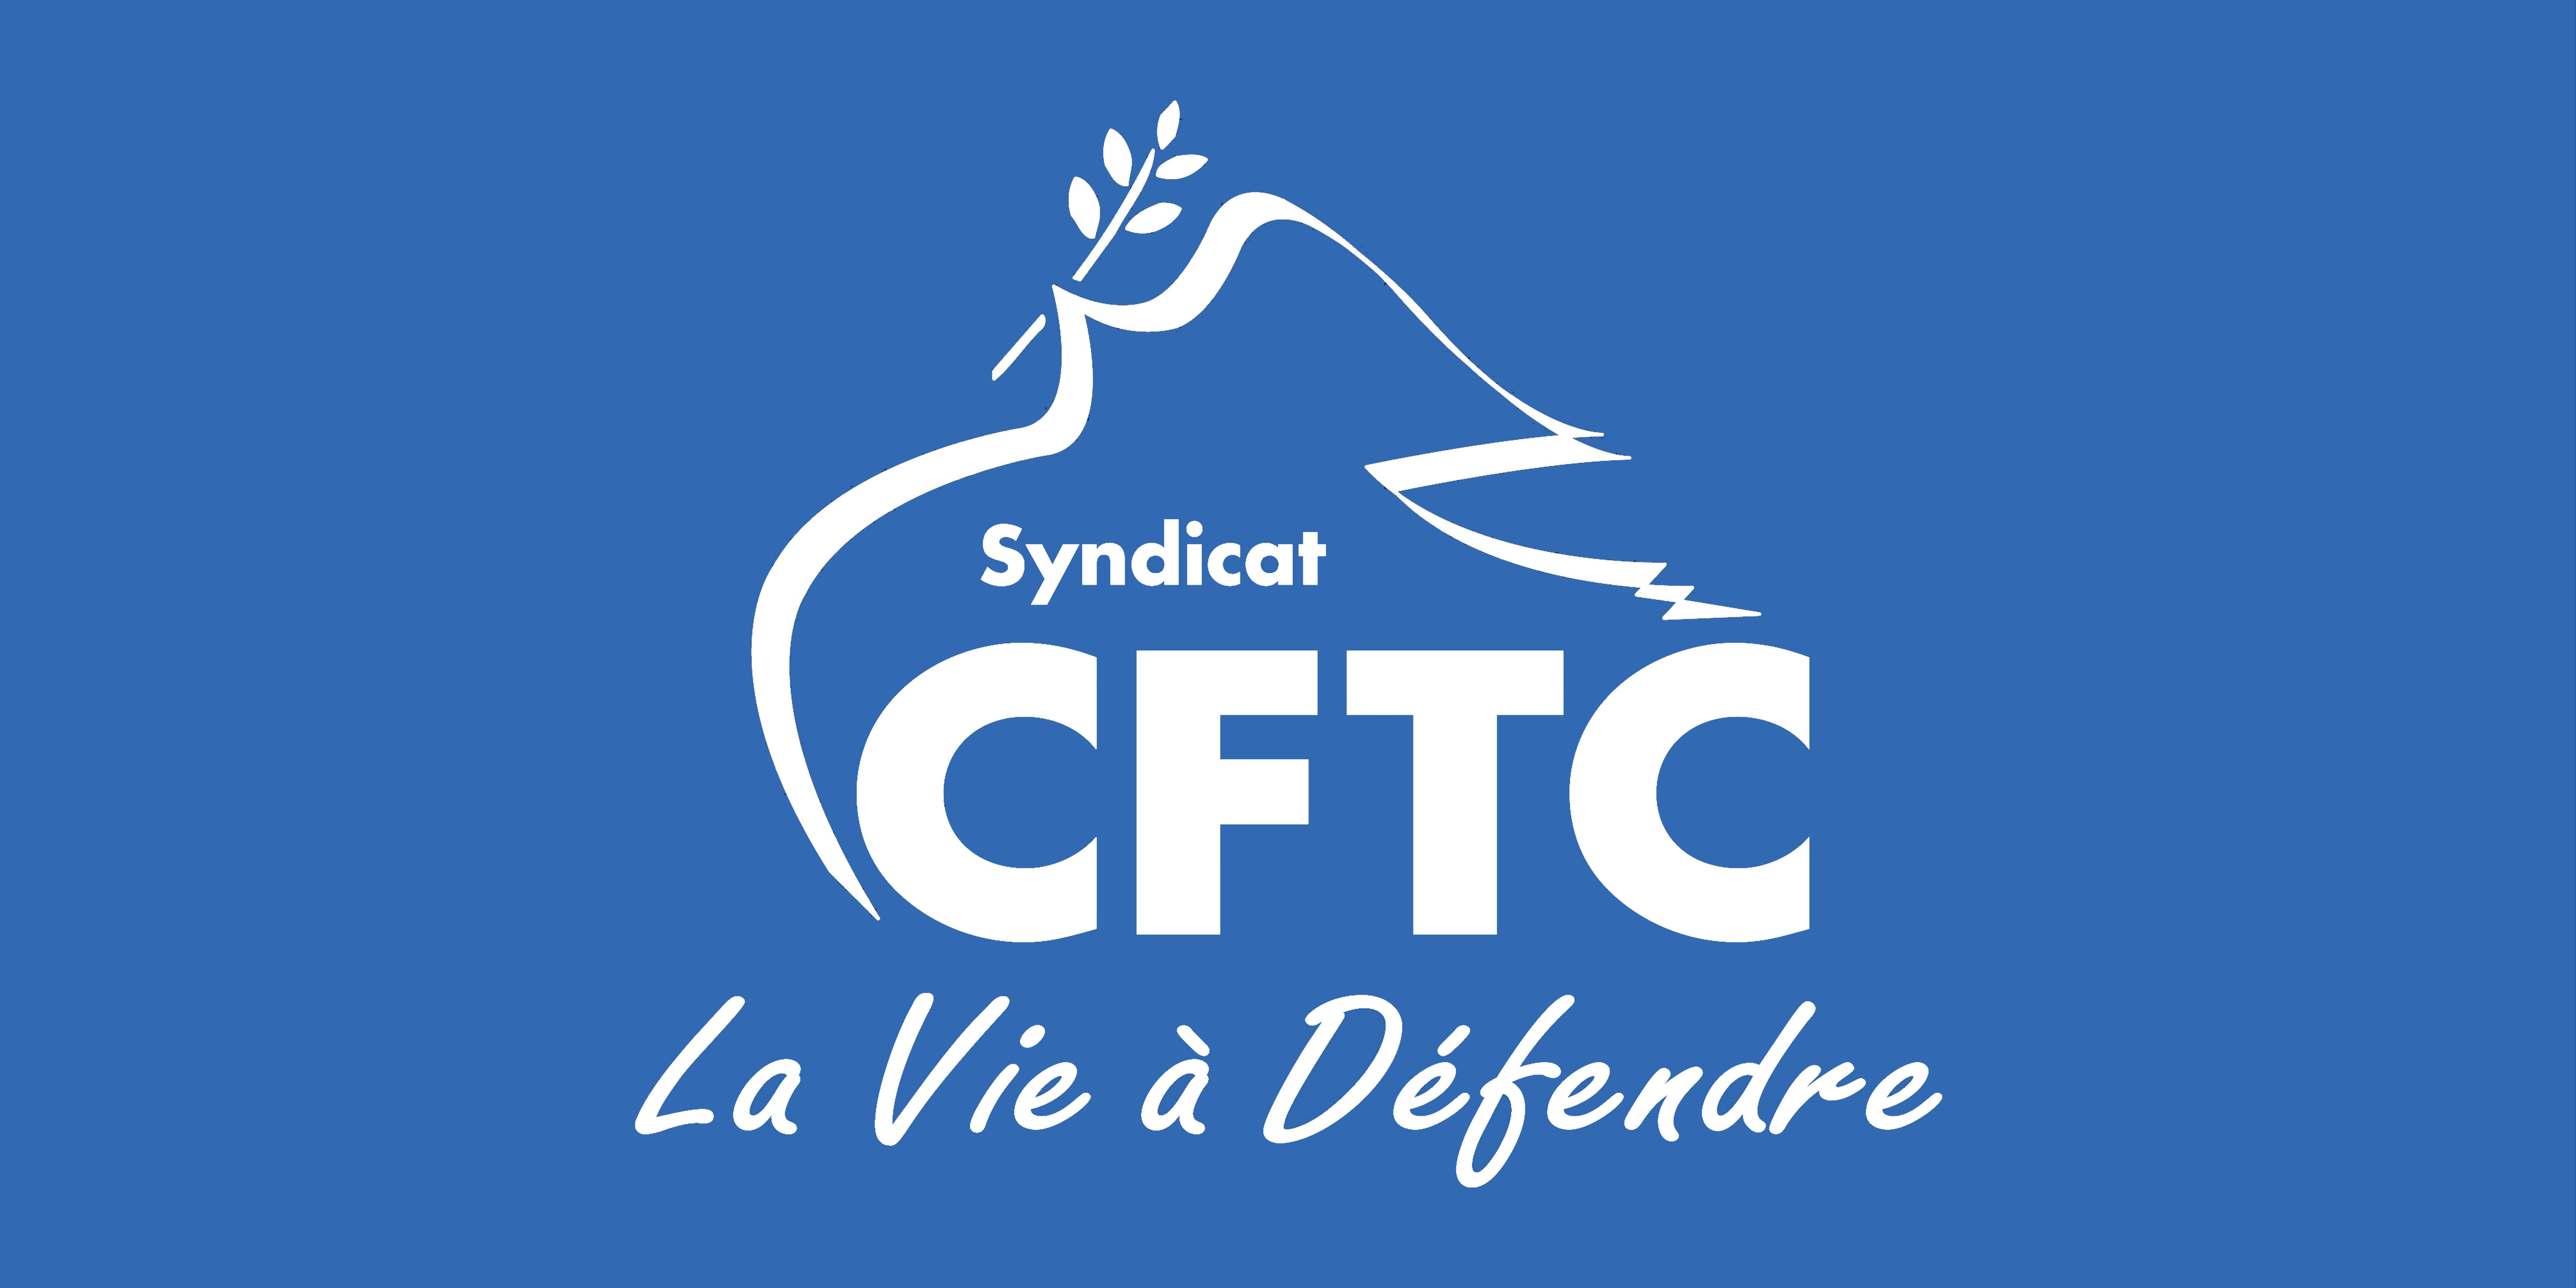 Syndicat CFTC